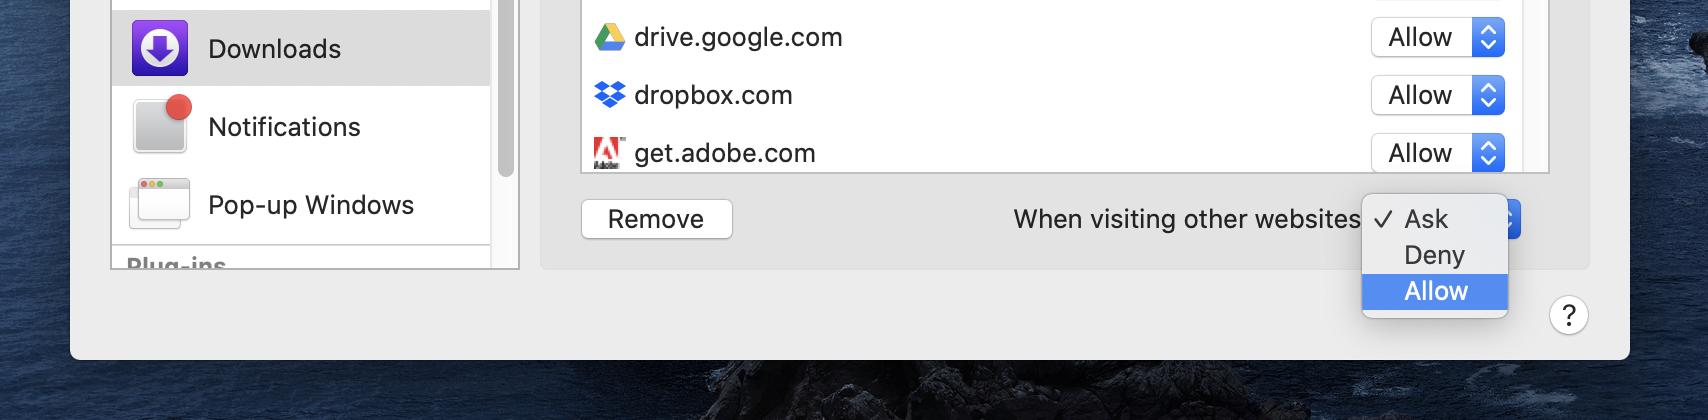 How to always allow downloads in Safari walkthrough 2